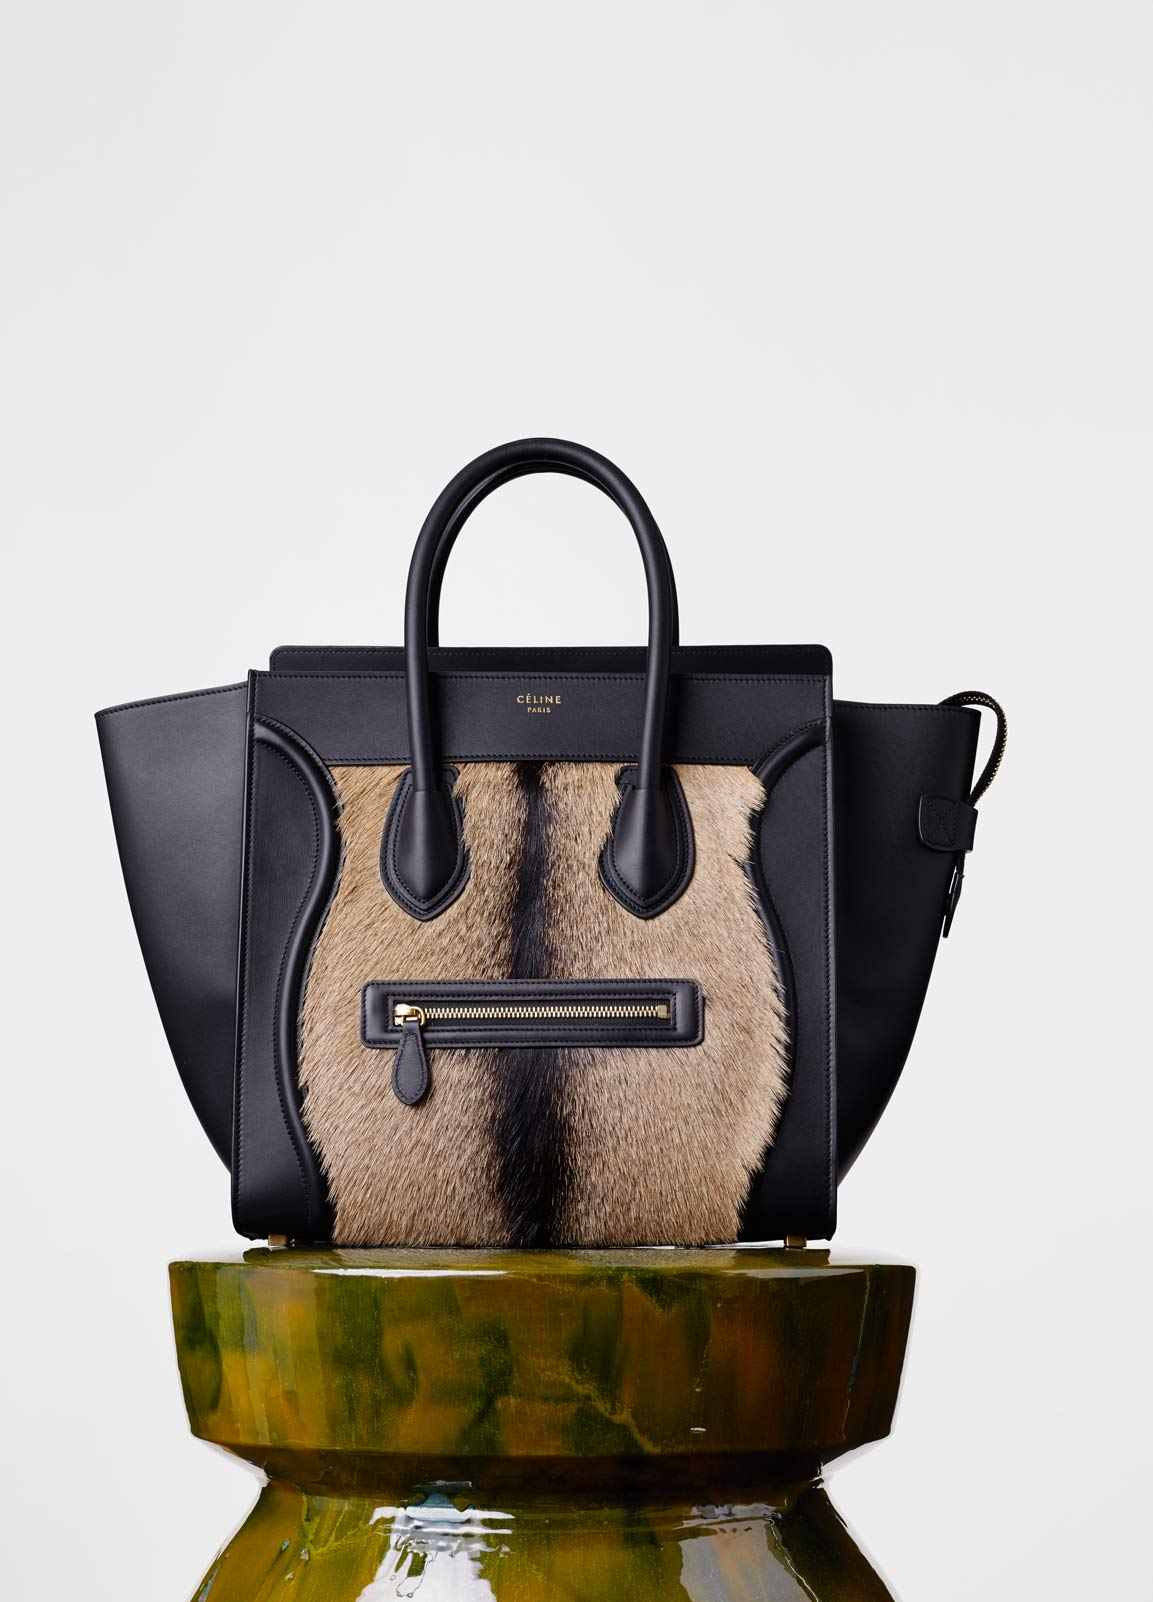 celine bags buy online - Celine 2015 Fall & Winter Bag Collection | Lollipuff